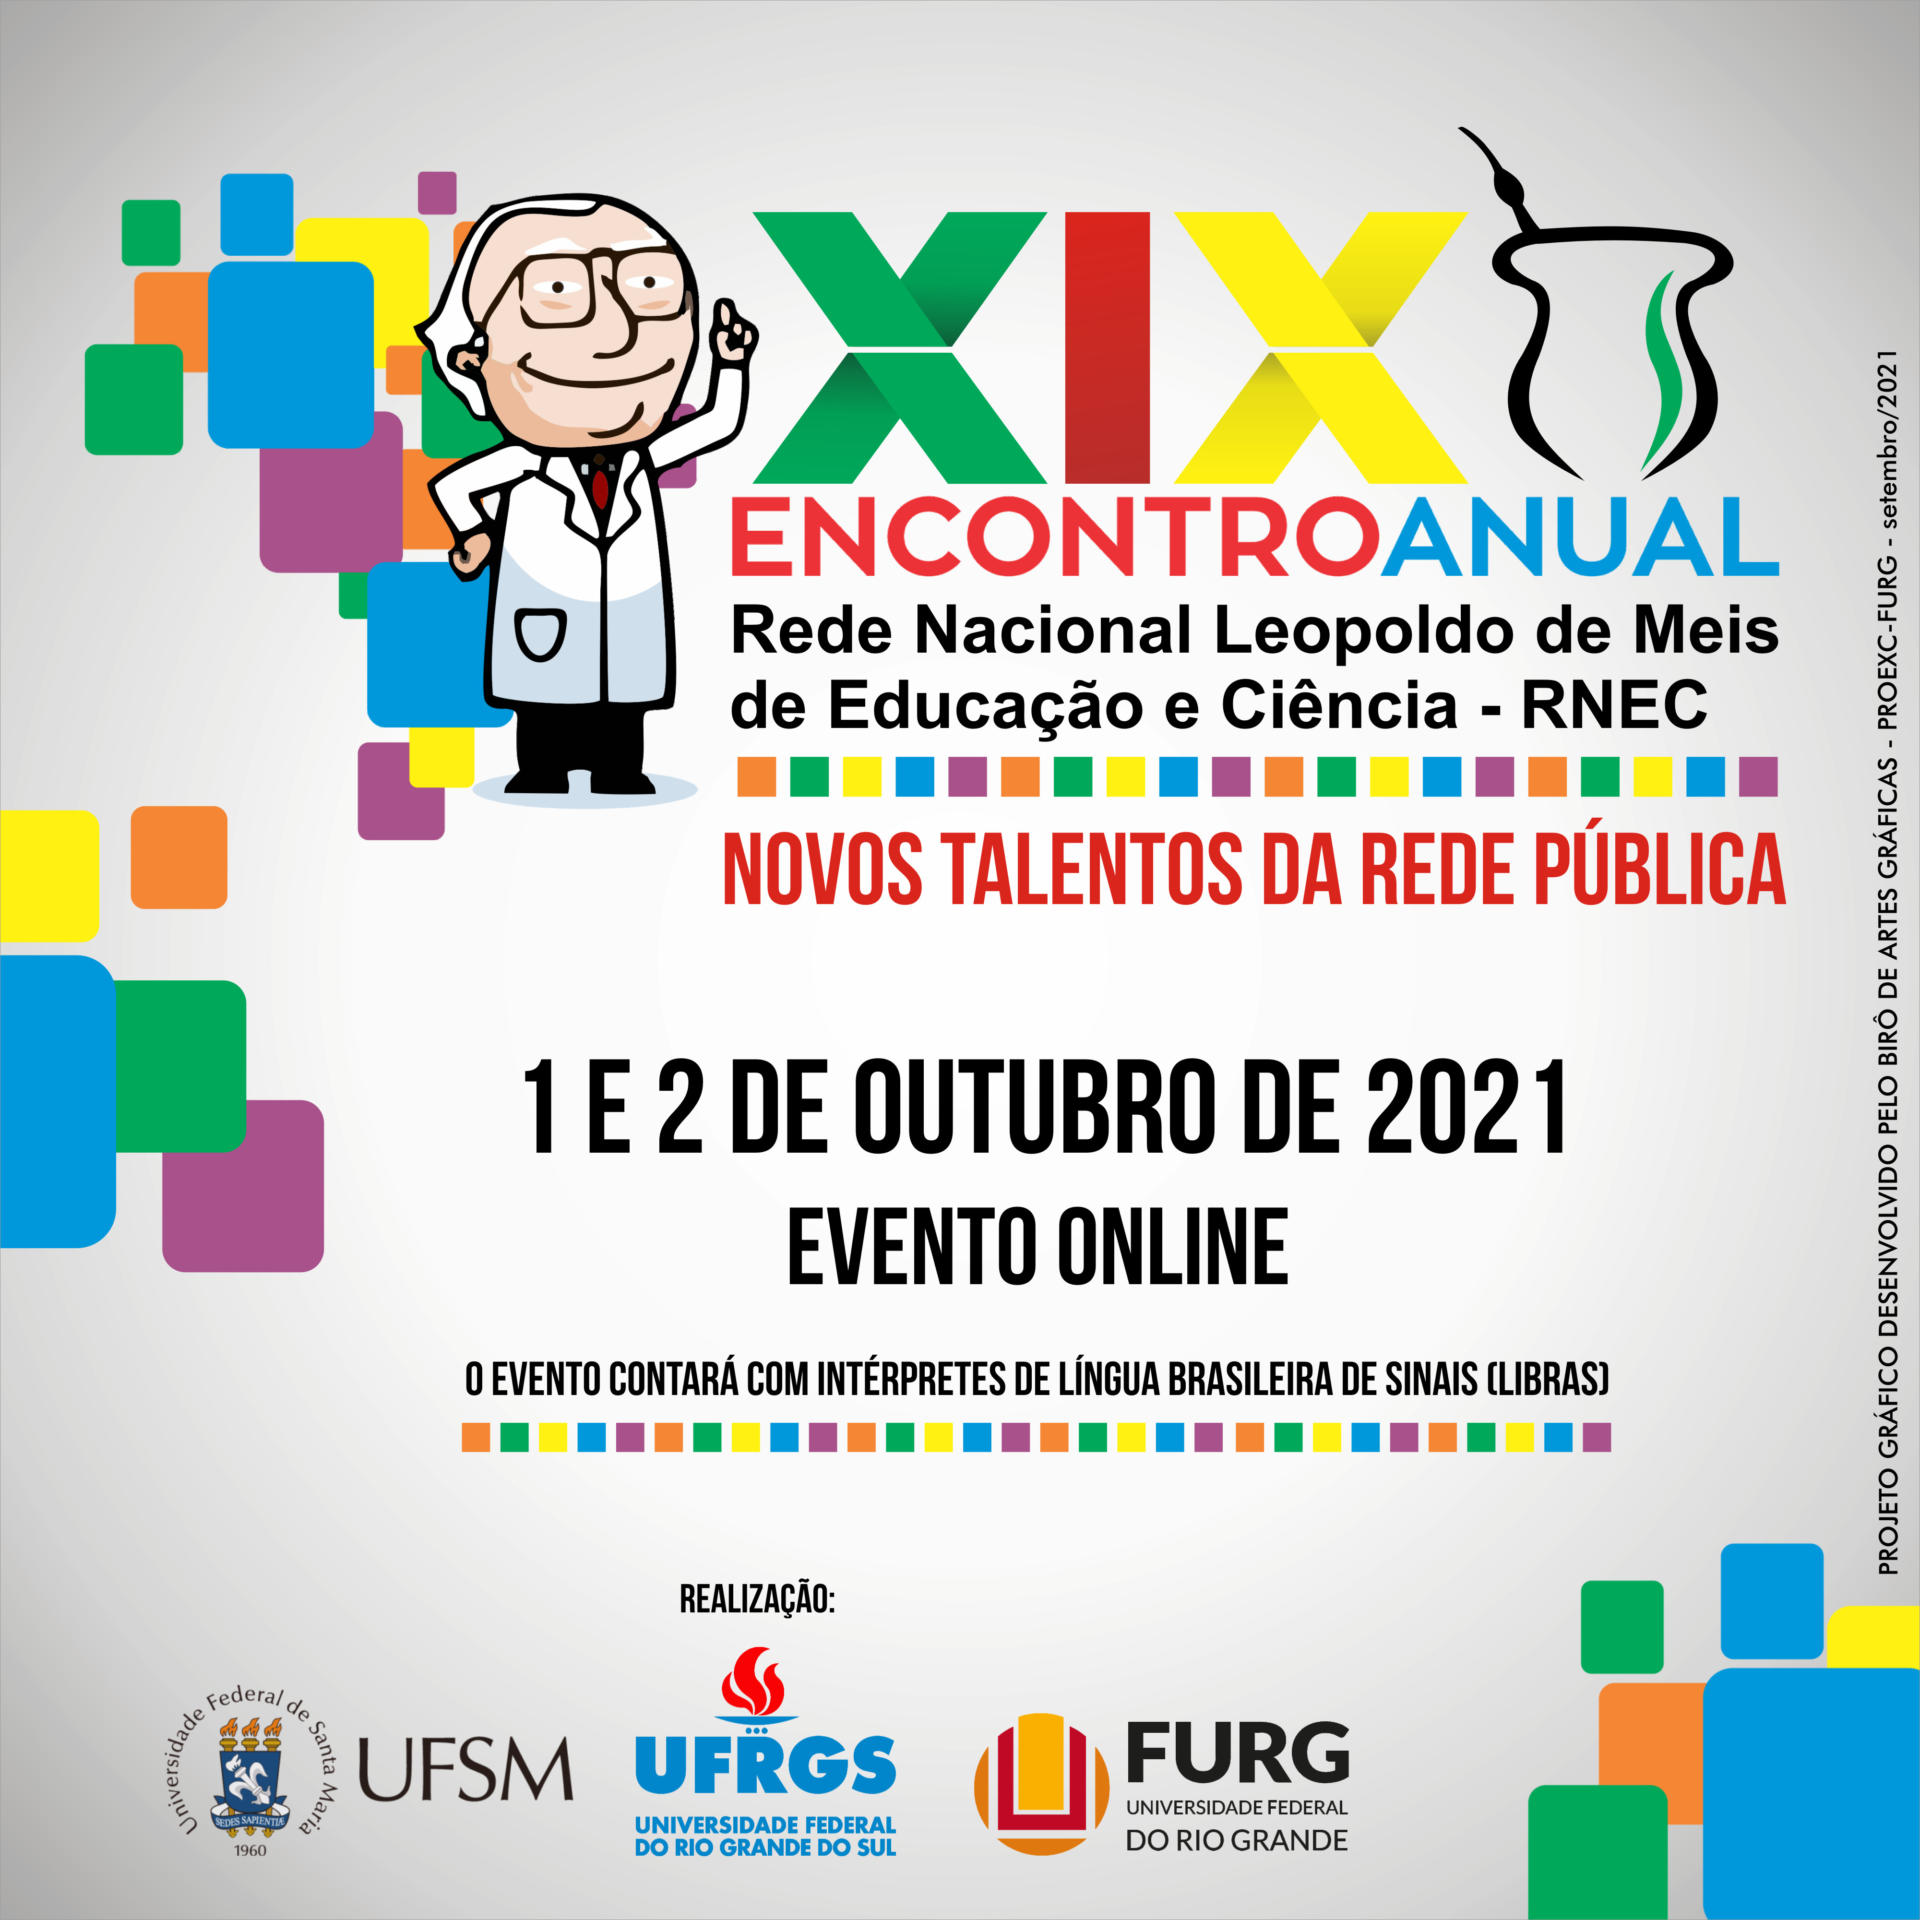 XIX ENCONTRO ANUAL - Rede Leopoldo de Meis